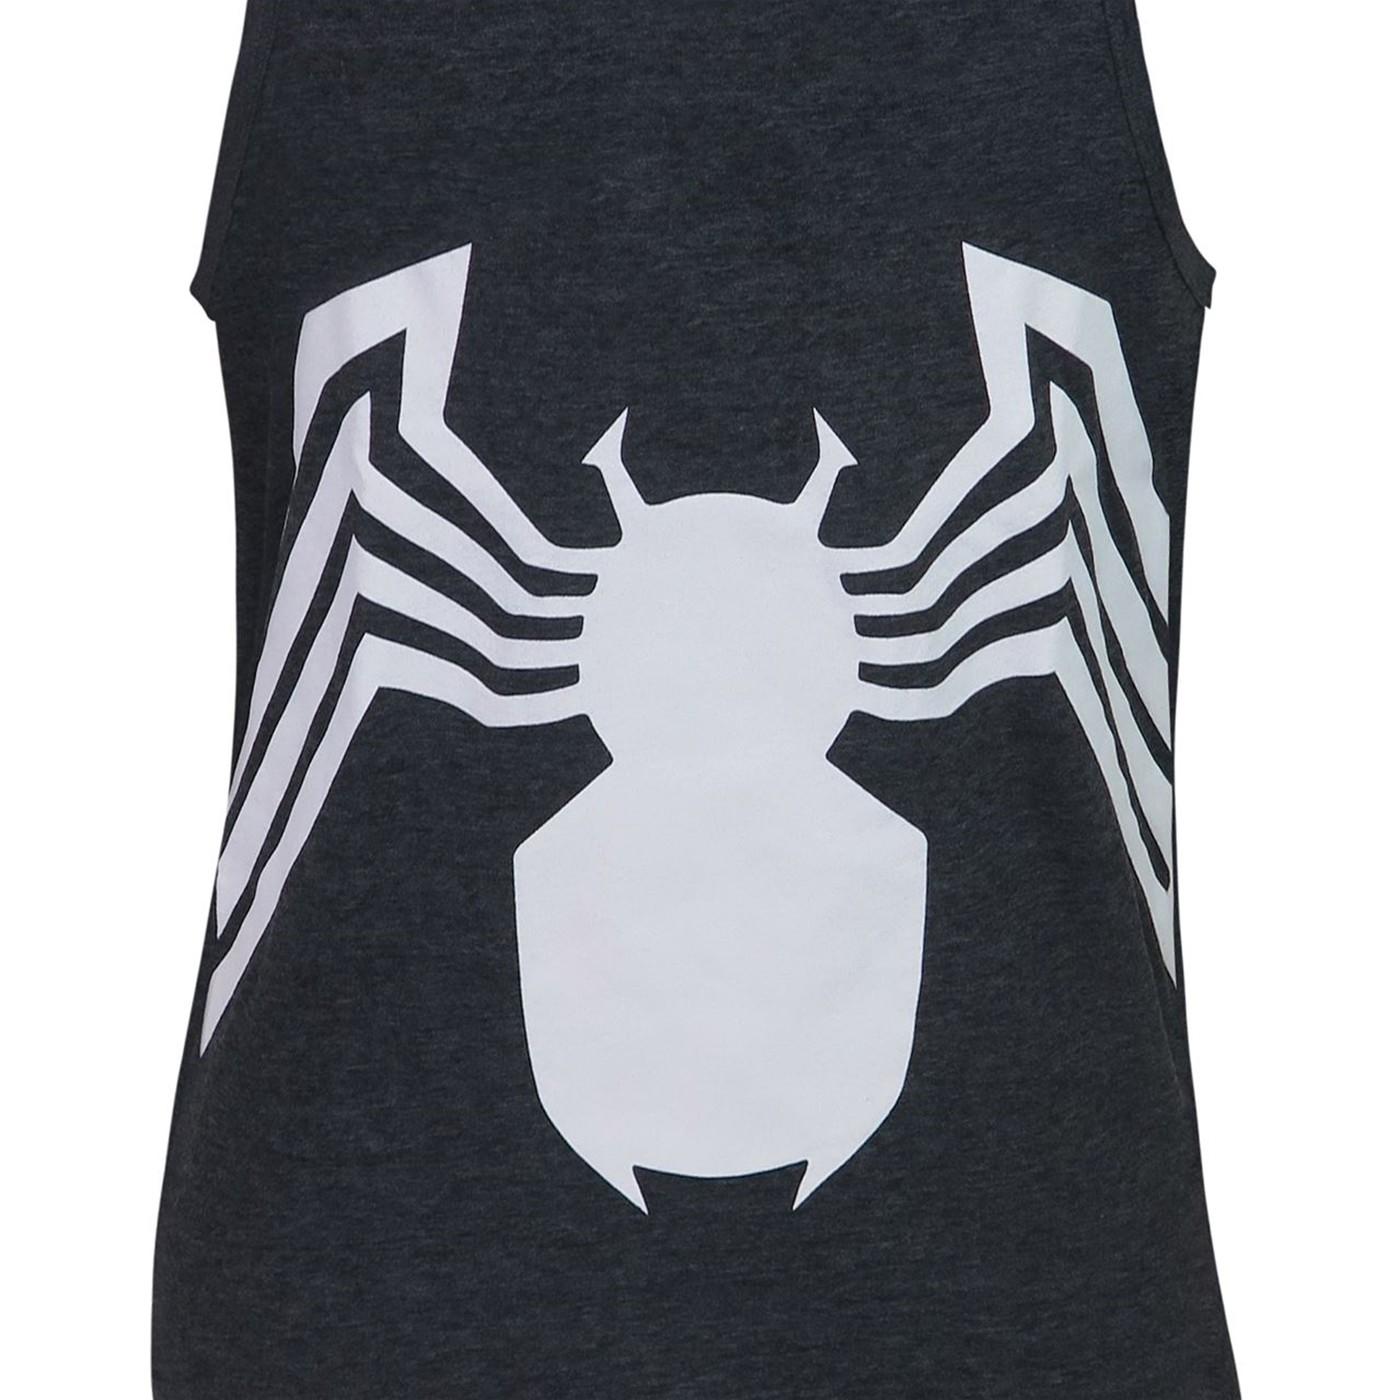 Venom Symbol Heather Charcoal Tank Top